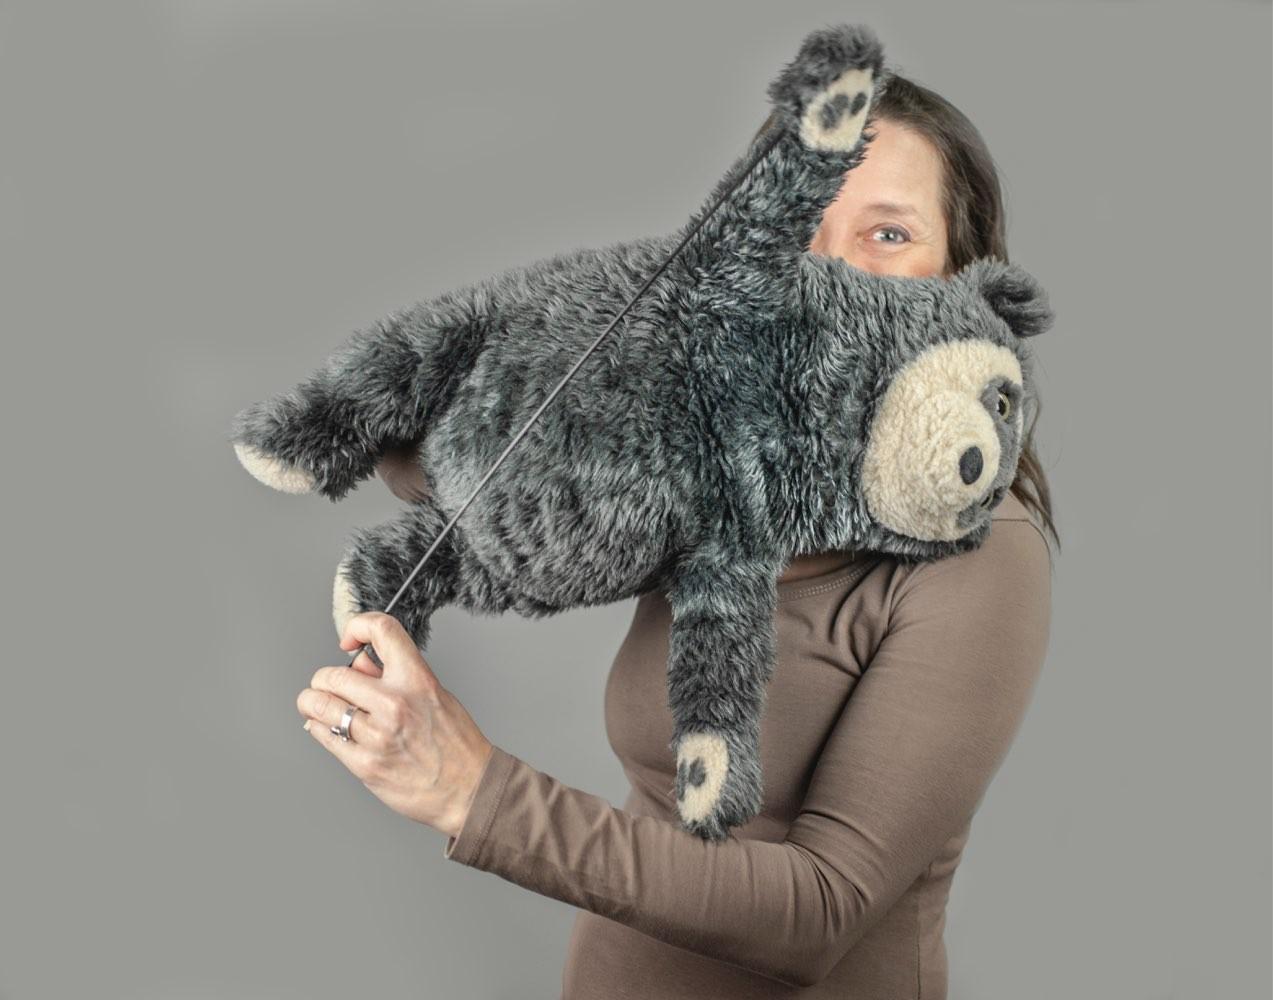 Tiina viser fram Brillebjørn's turnferdigheter